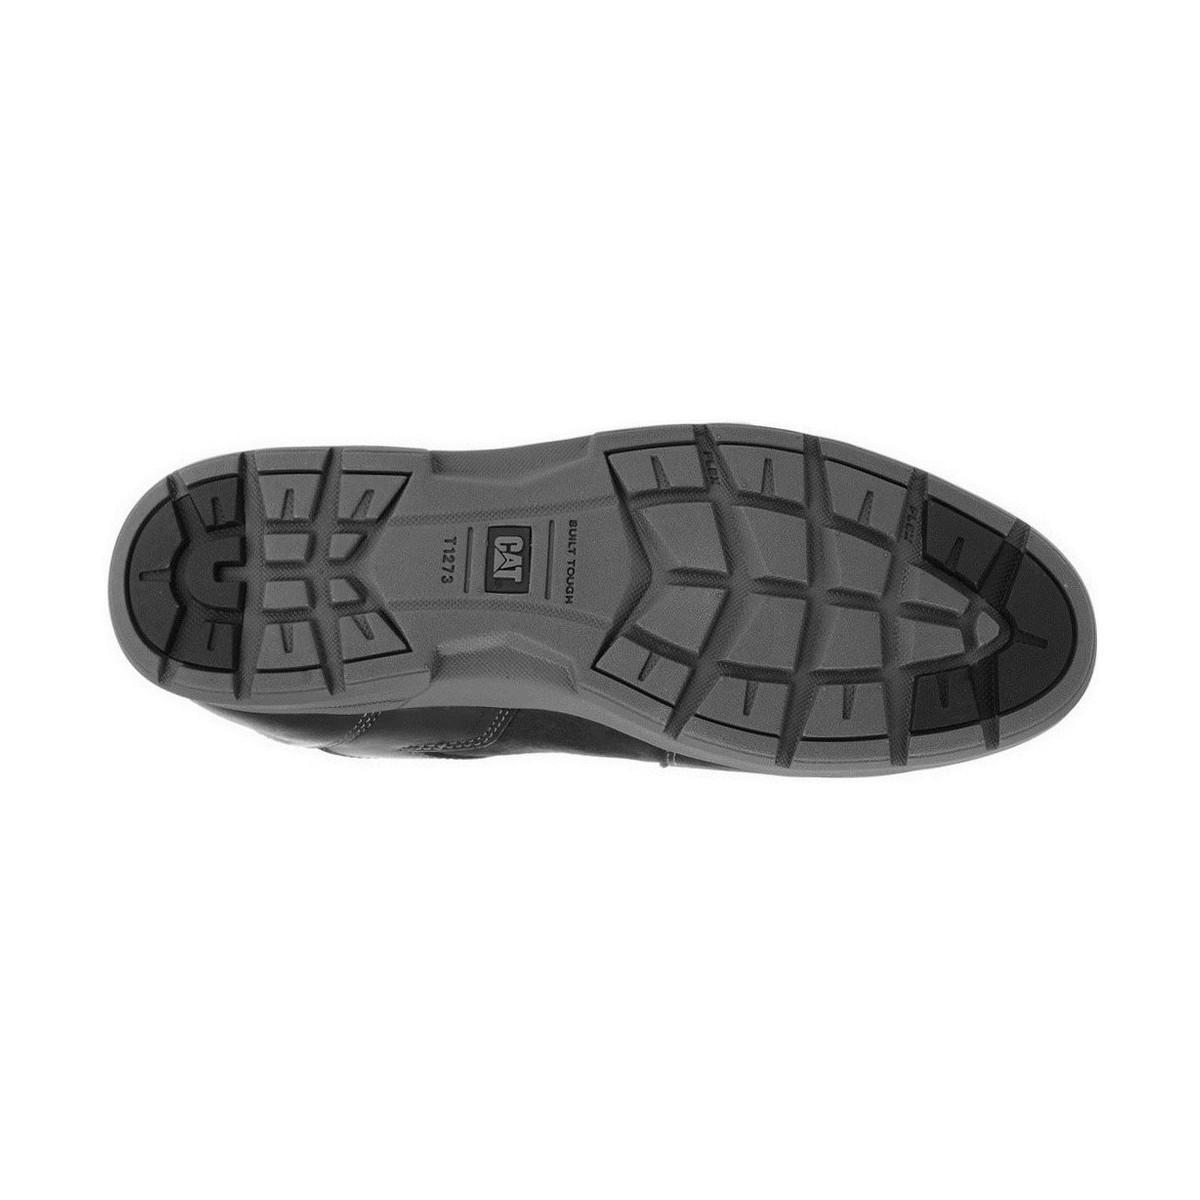 Caterpillar Cat Ebb Men's Shoes (trainers) In Black for Men